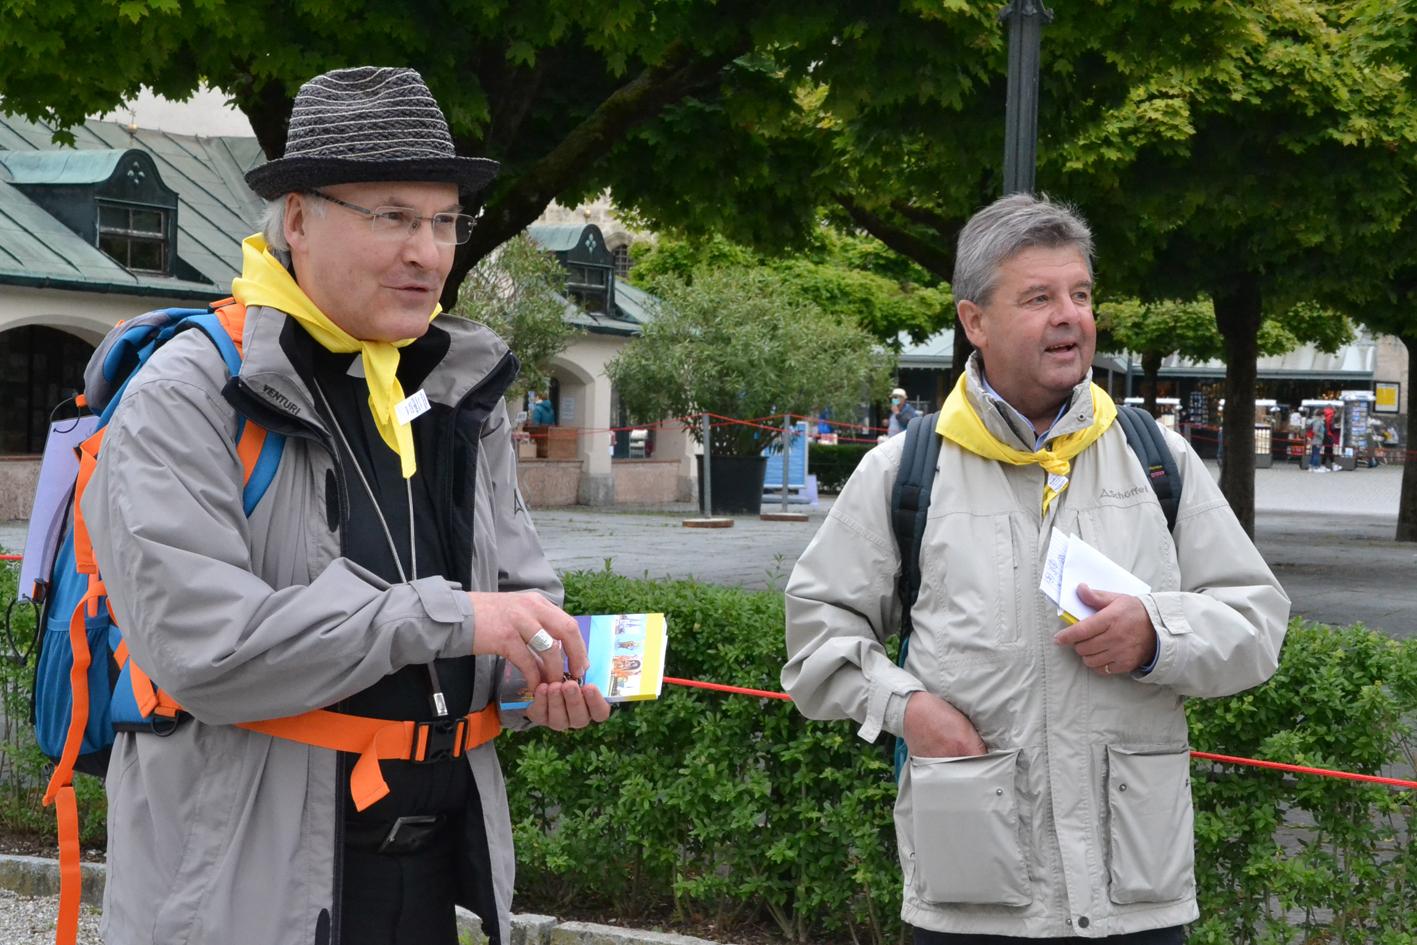 2020 06 04 aoelfb wallfahrt regensburg1